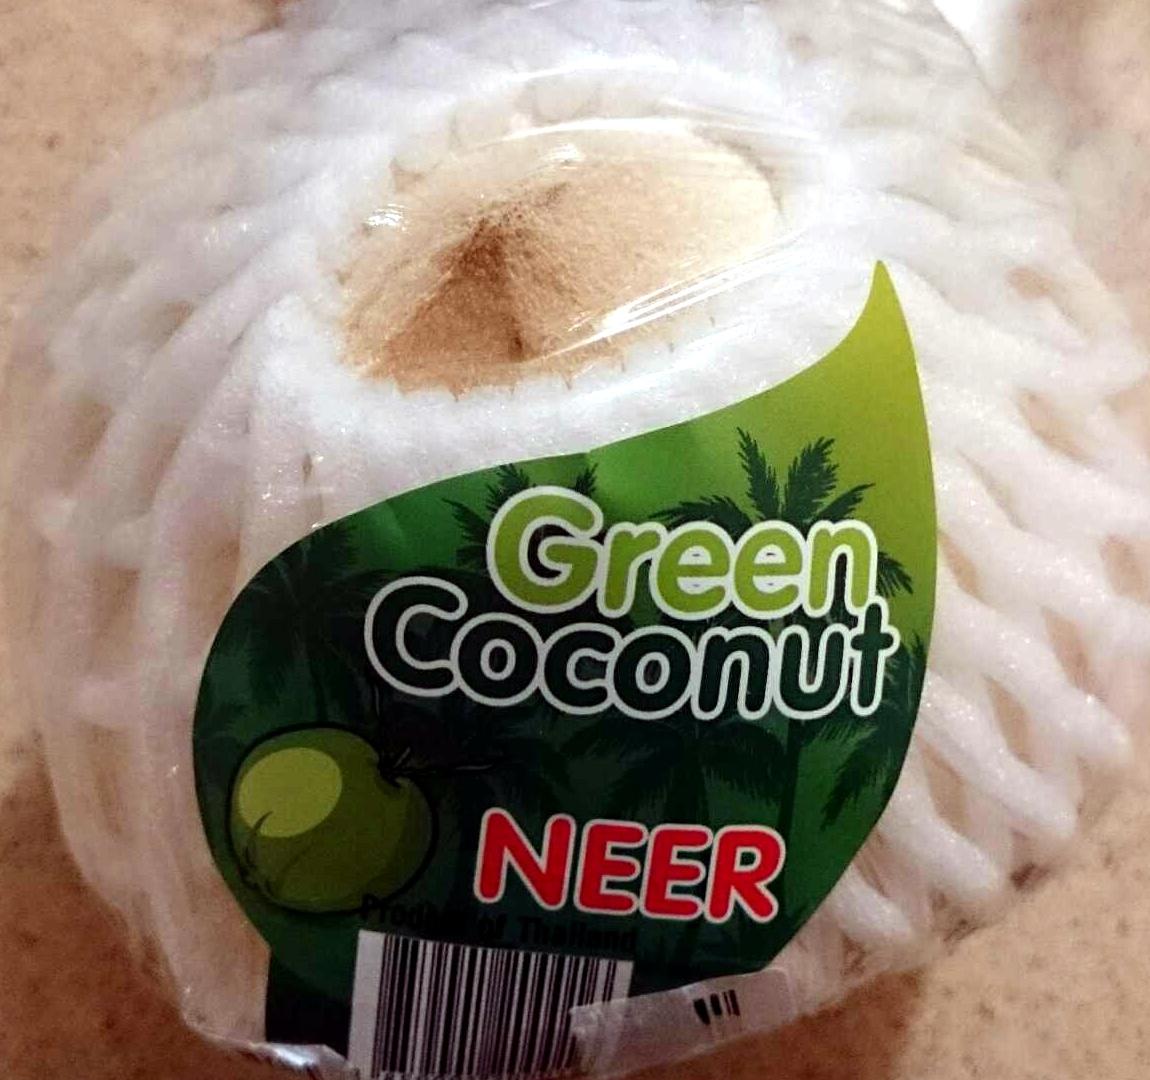 Green Coconut - Product - en